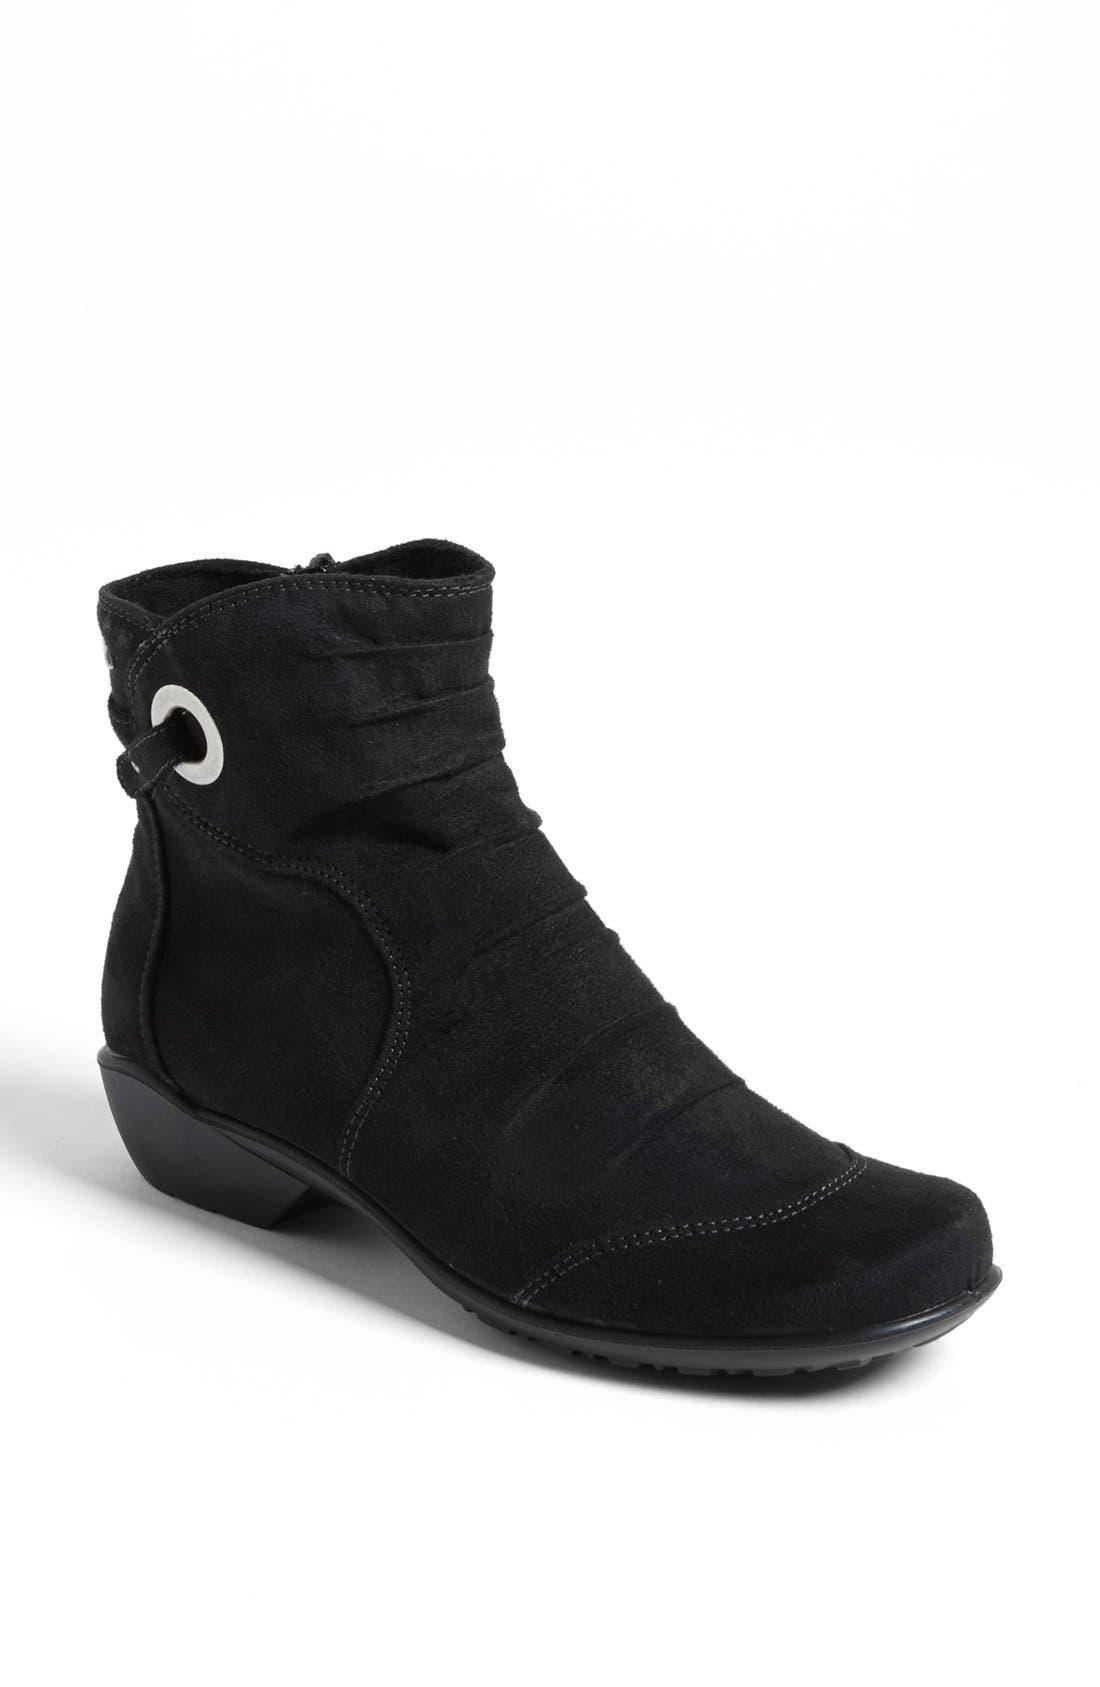 Alternate Image 1 Selected - Romika® 'Citytex 121' Boot